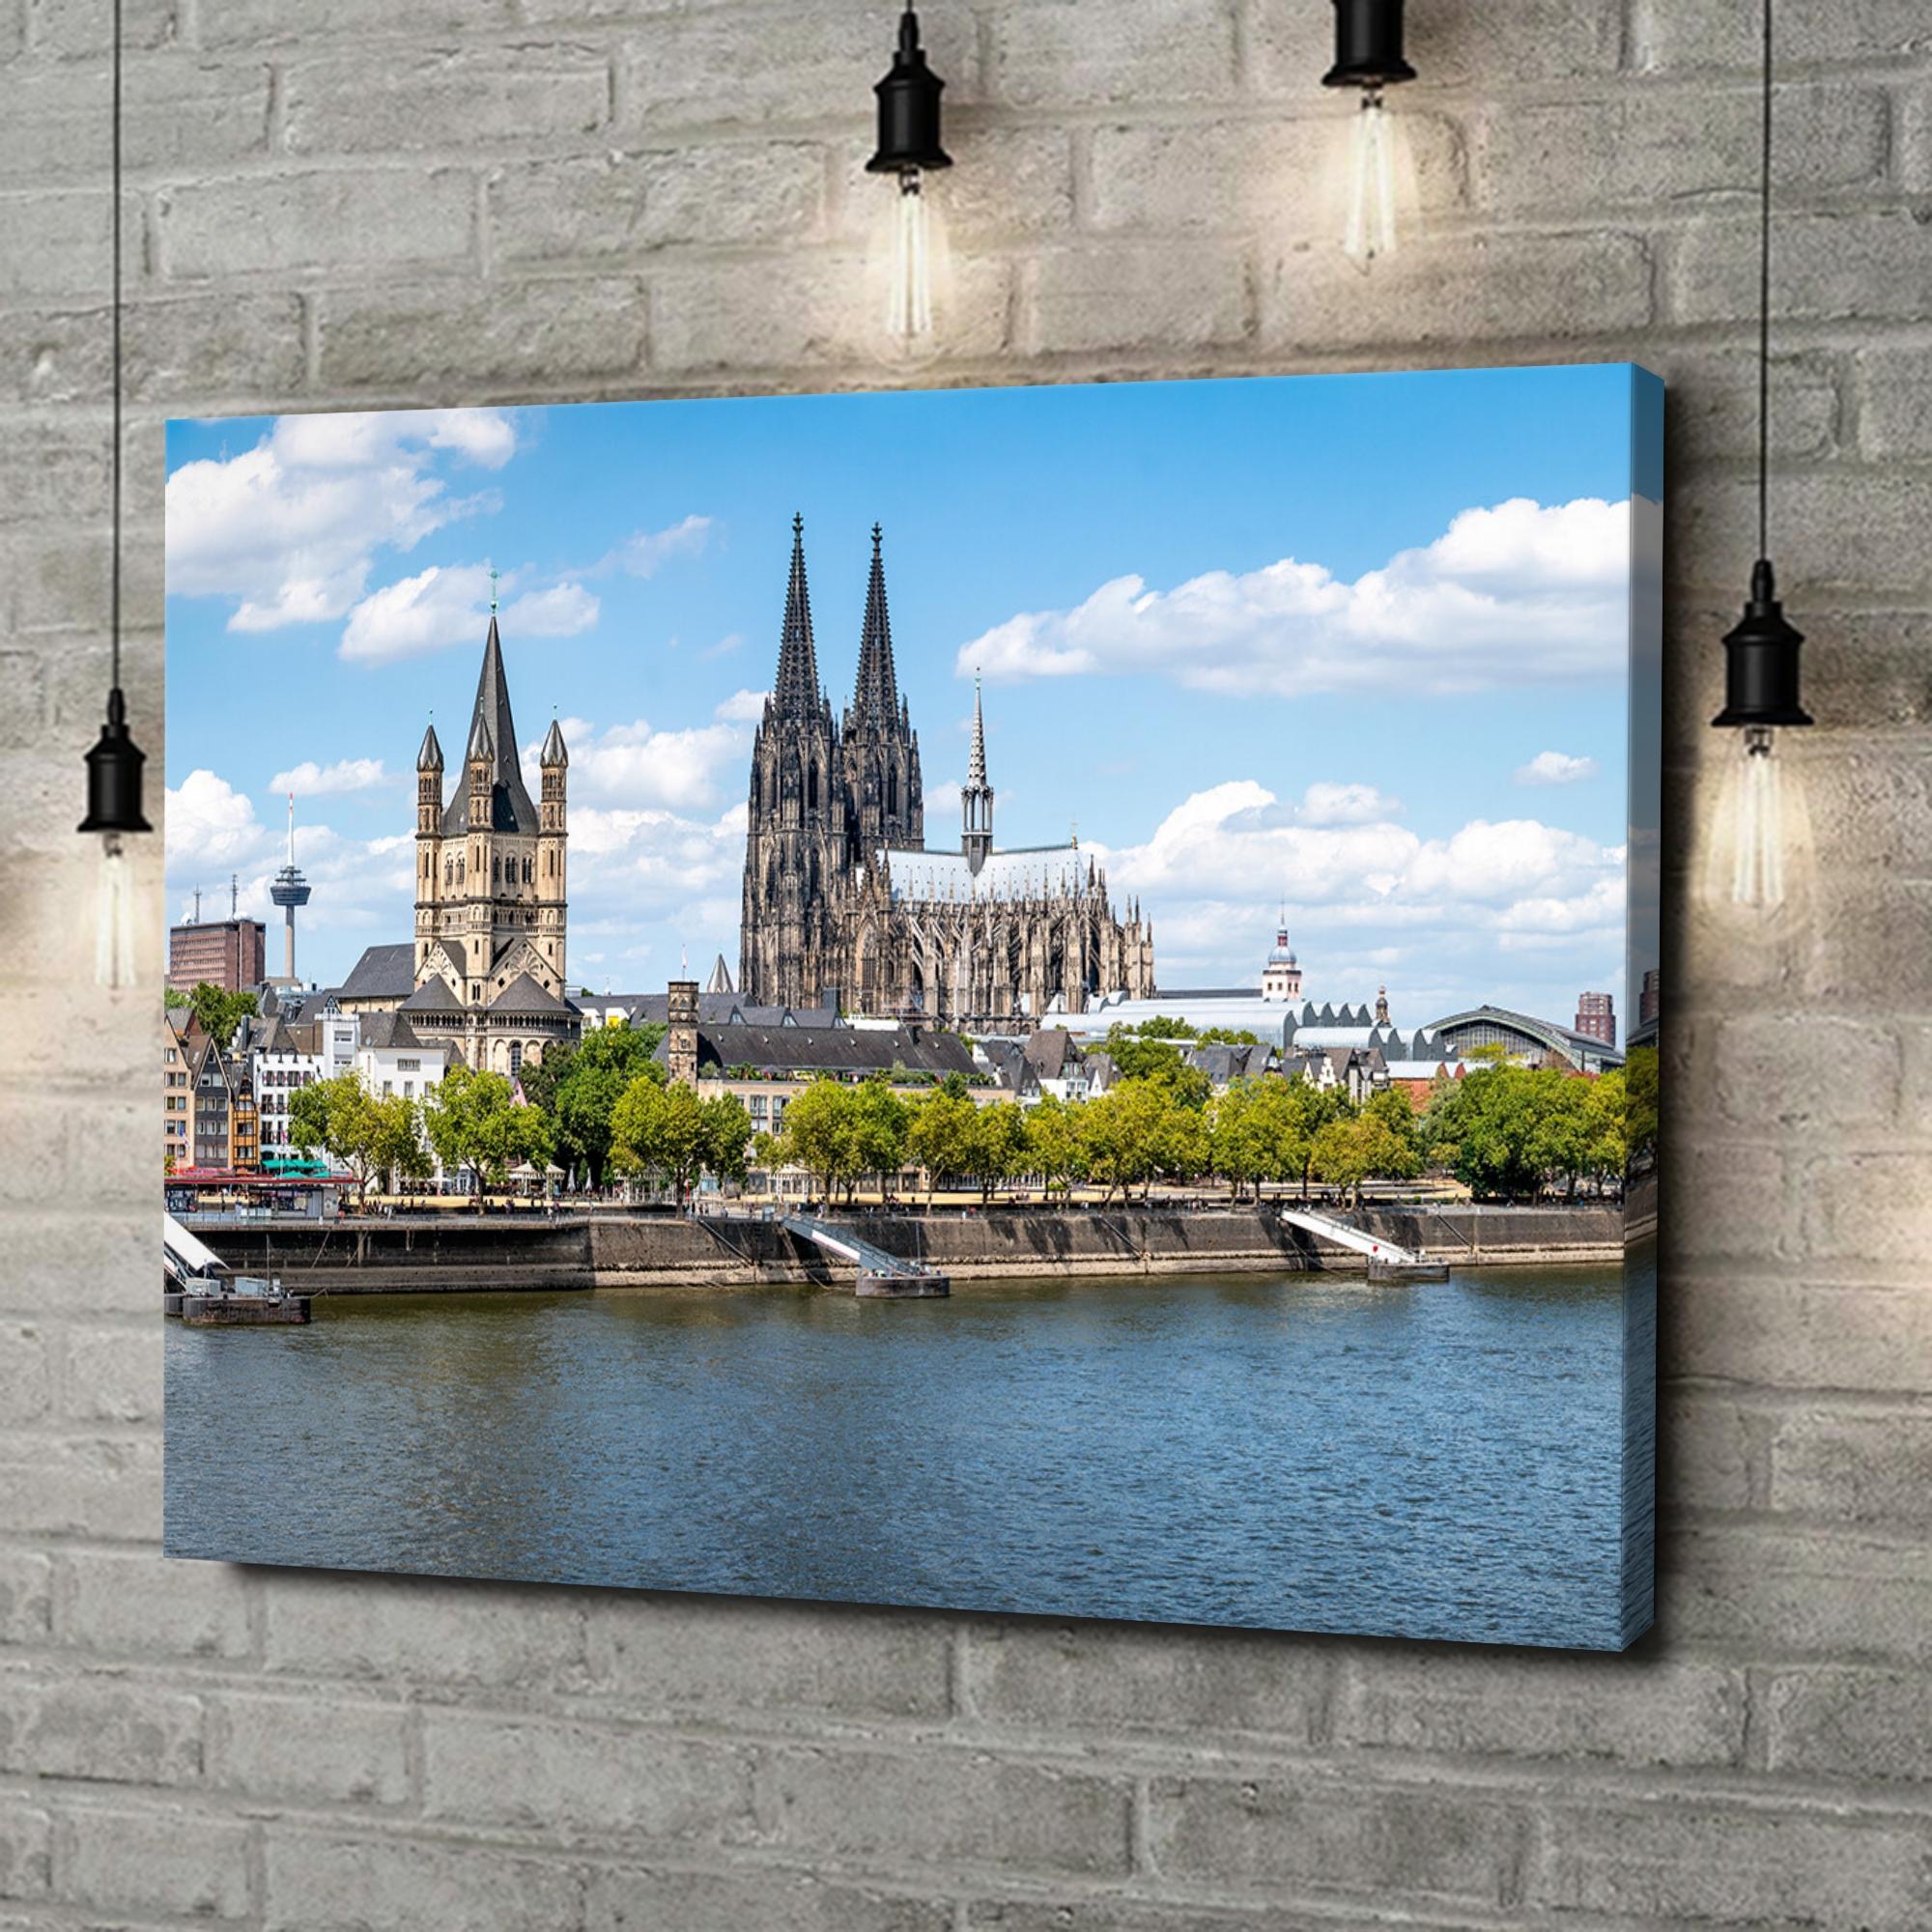 Leinwandbild personalisiert Kölner Dom